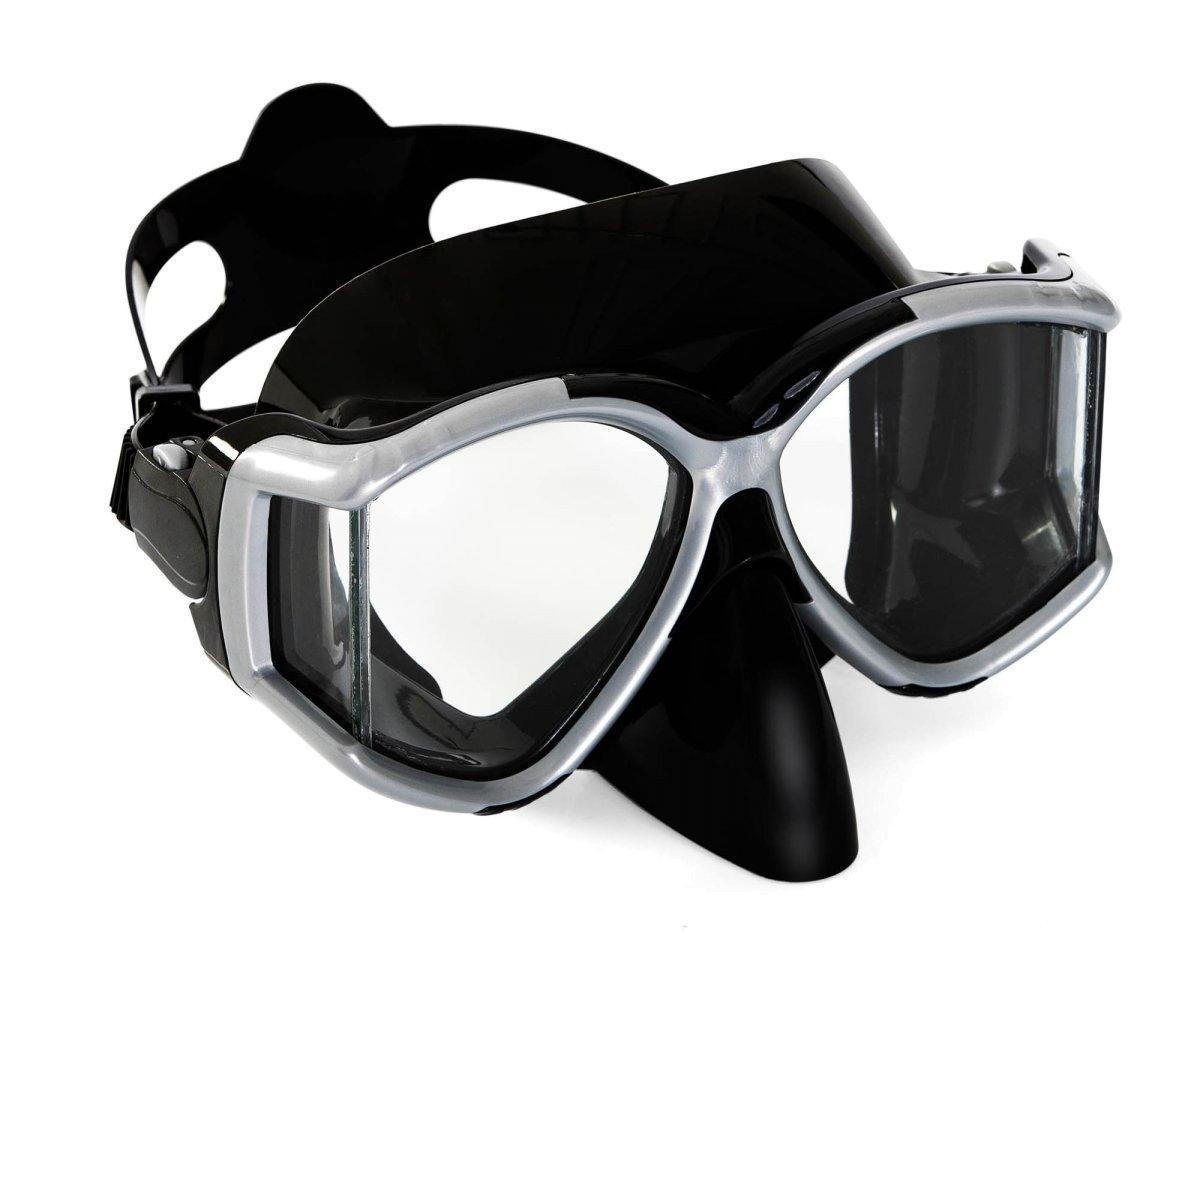 Маска для плавания Bestway 22060, размер XL, (10+), обхват голов ≈ 56 см, черная